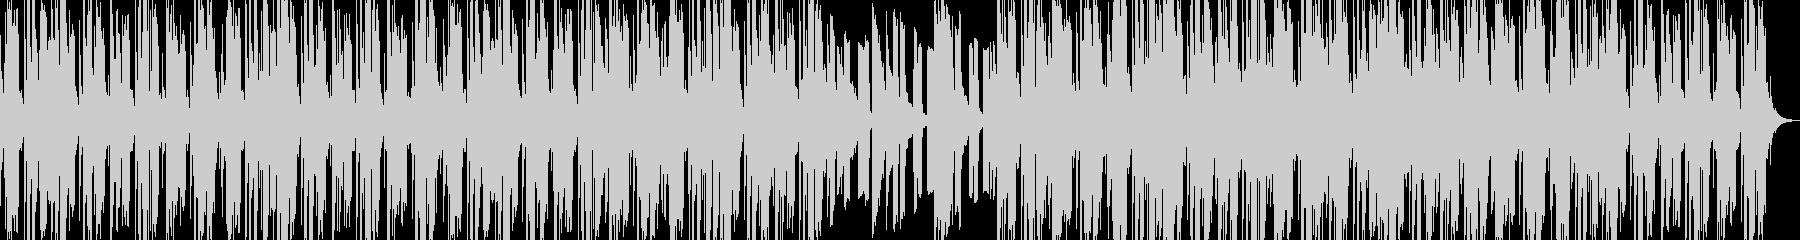 DUB調のピアノ曲の未再生の波形